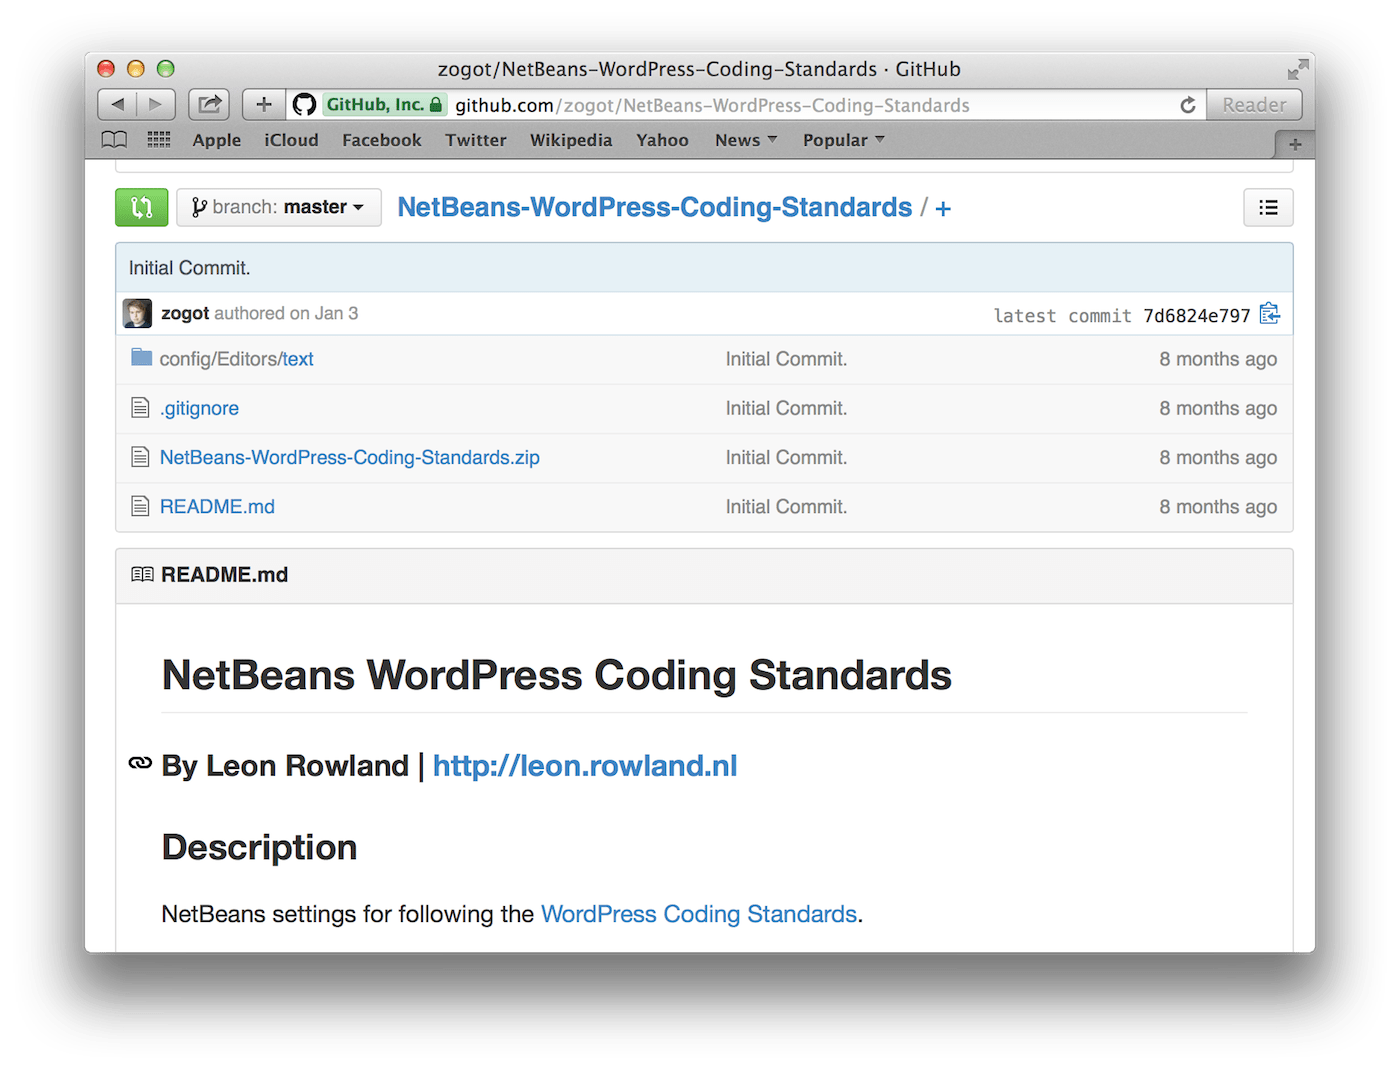 Add WordPress Coding Standards to NetBeans – WordPress Tavern